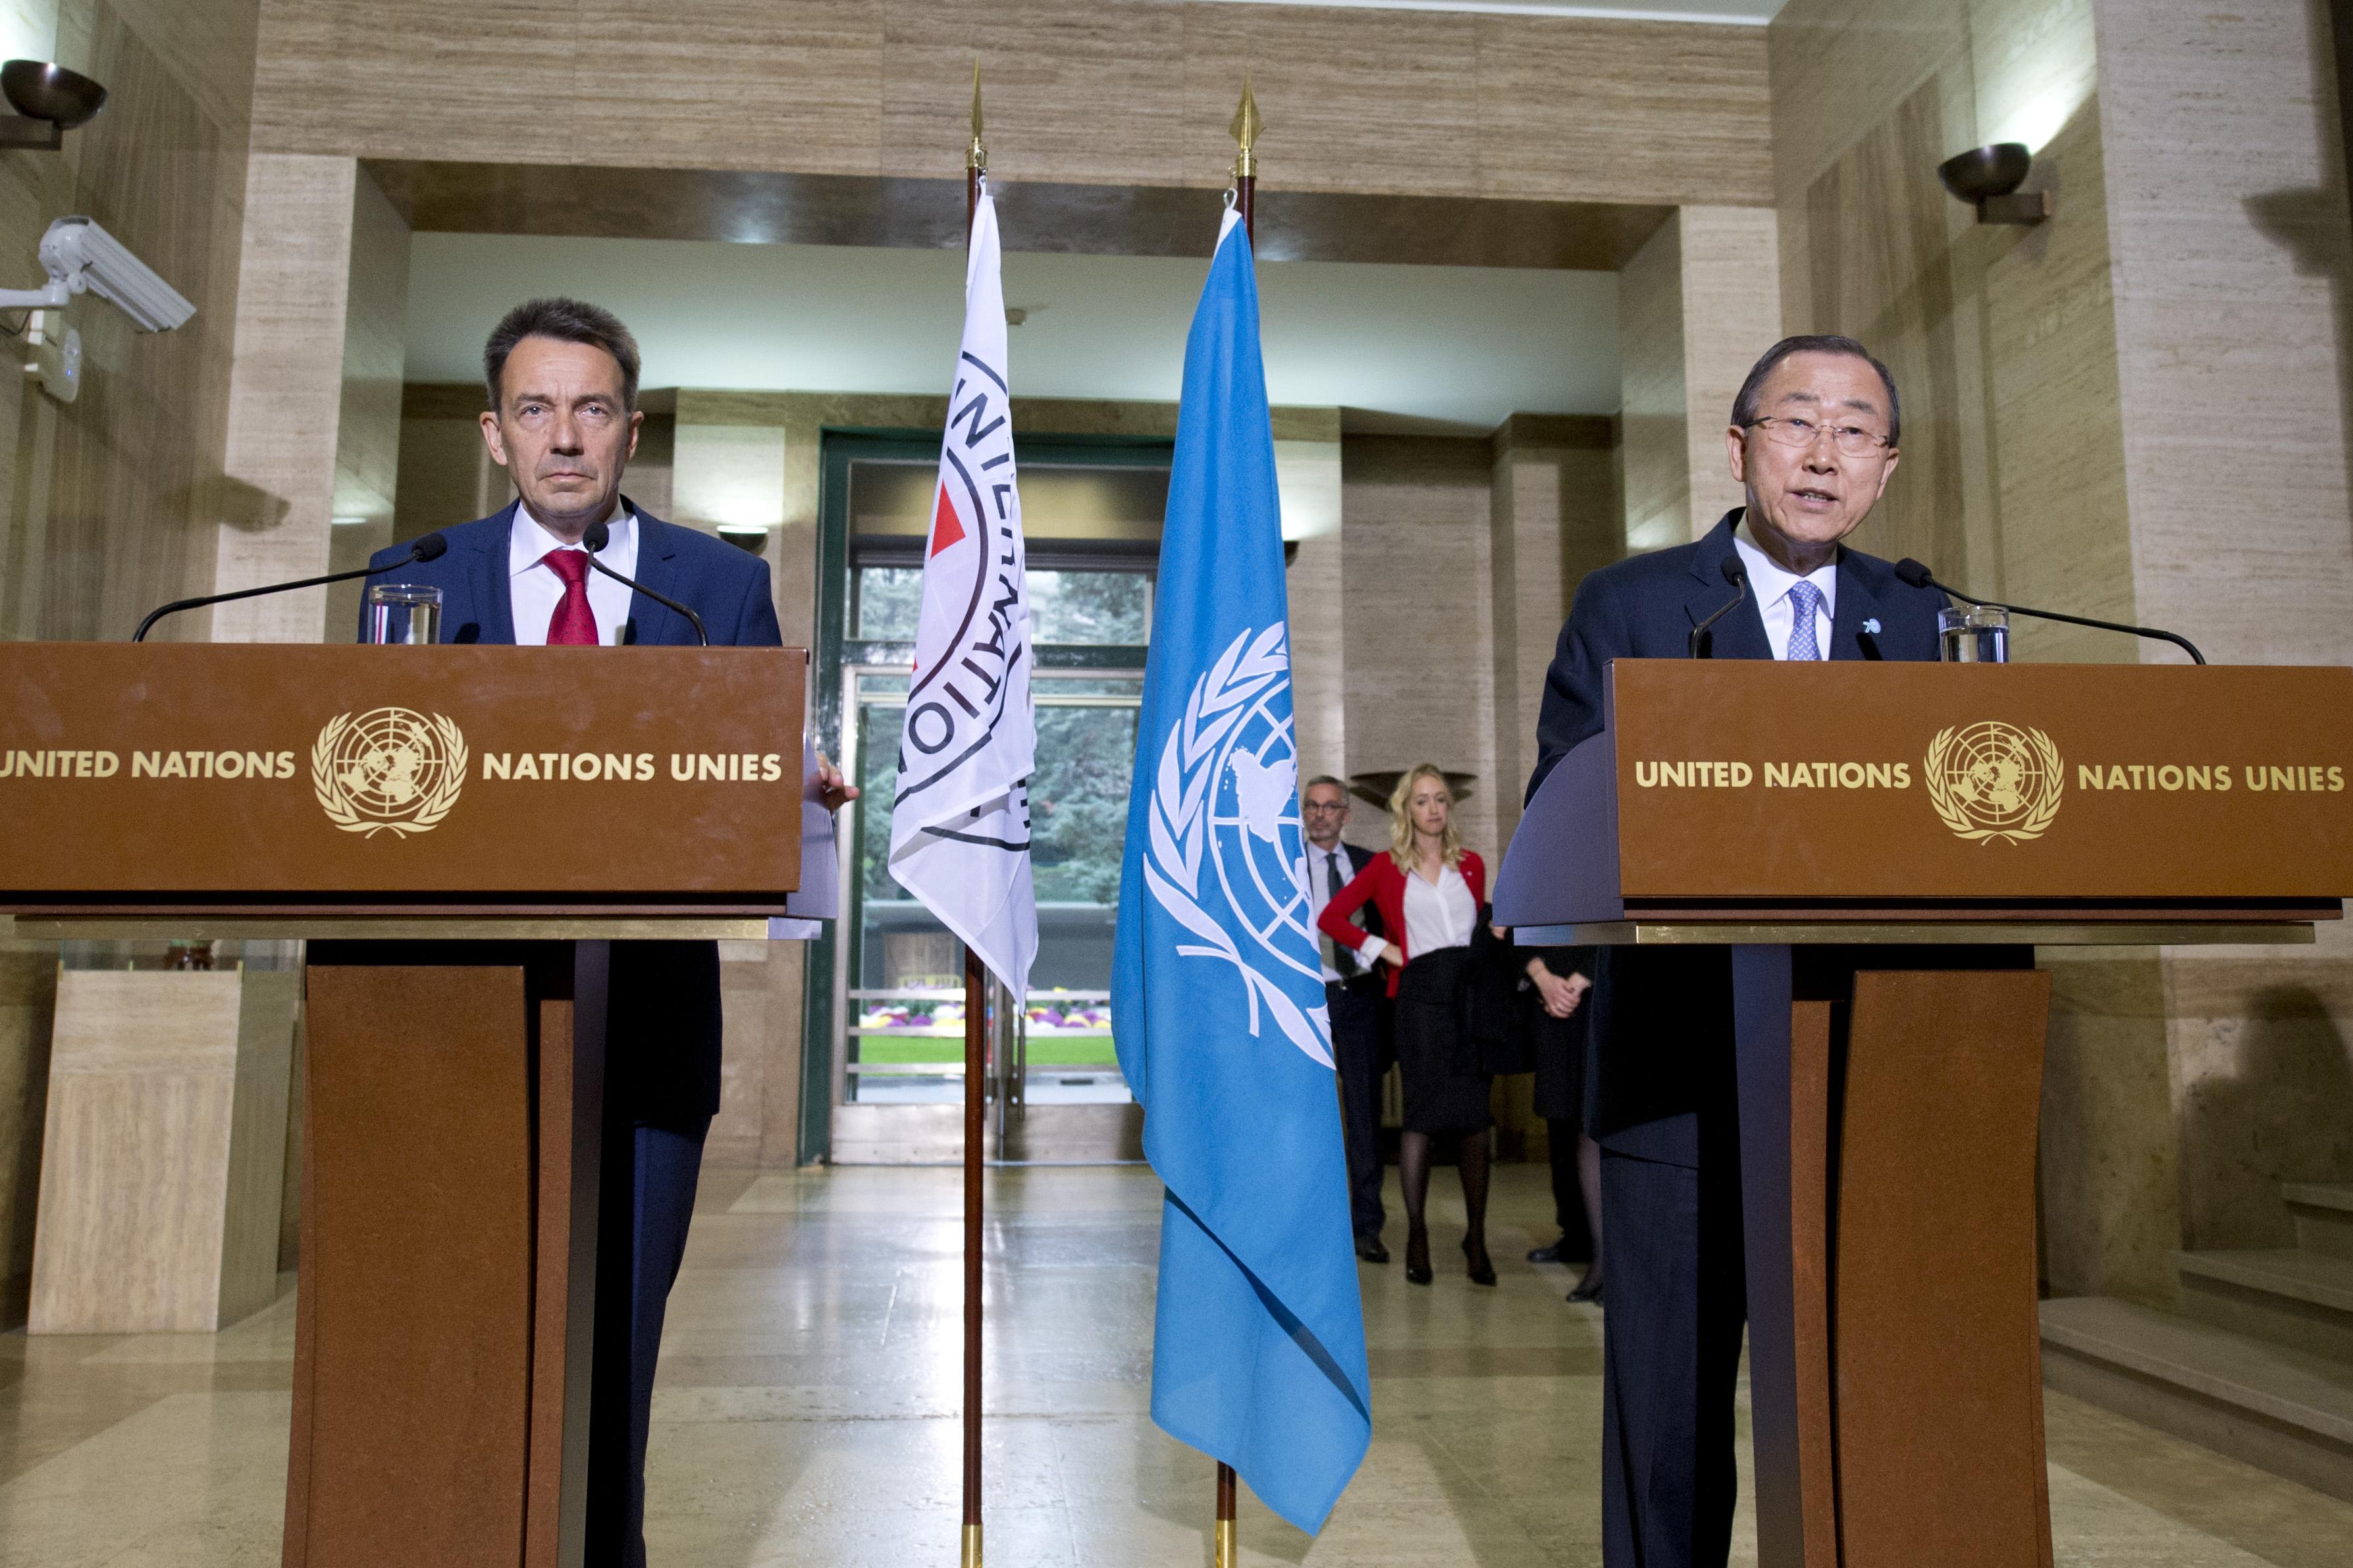 Ban Ki-moon and Peter Maurer